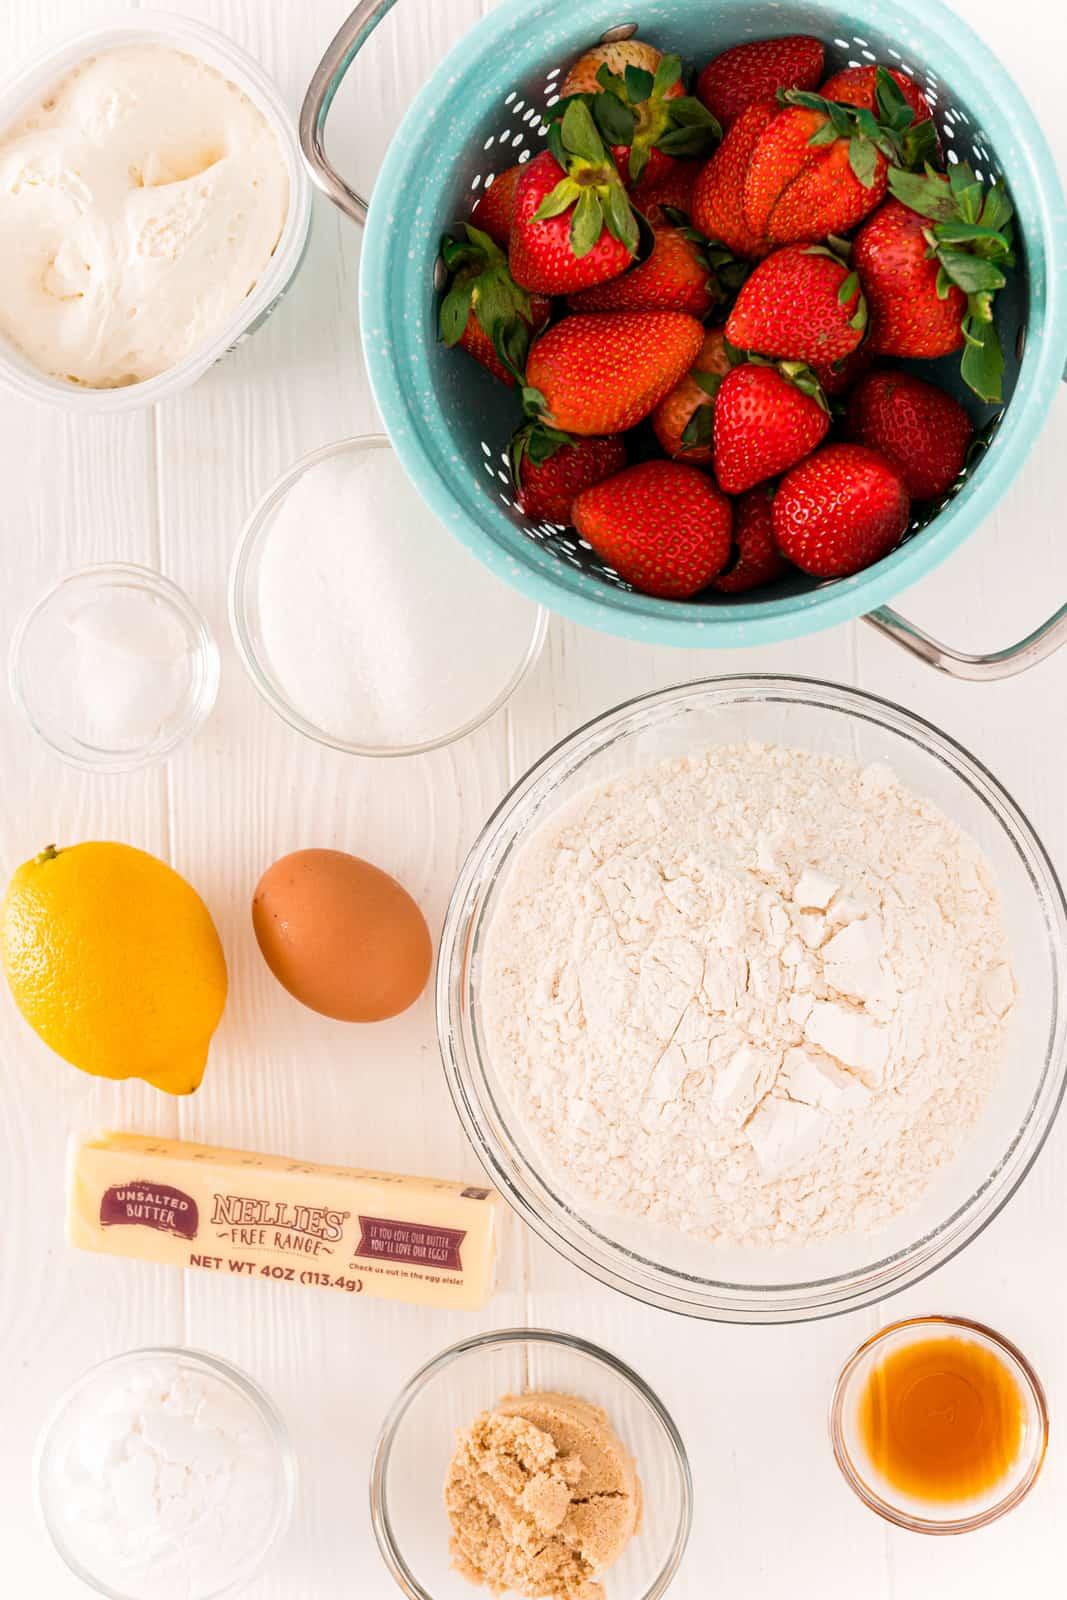 Ingredients needed to make Strawberry Shortcake Bars